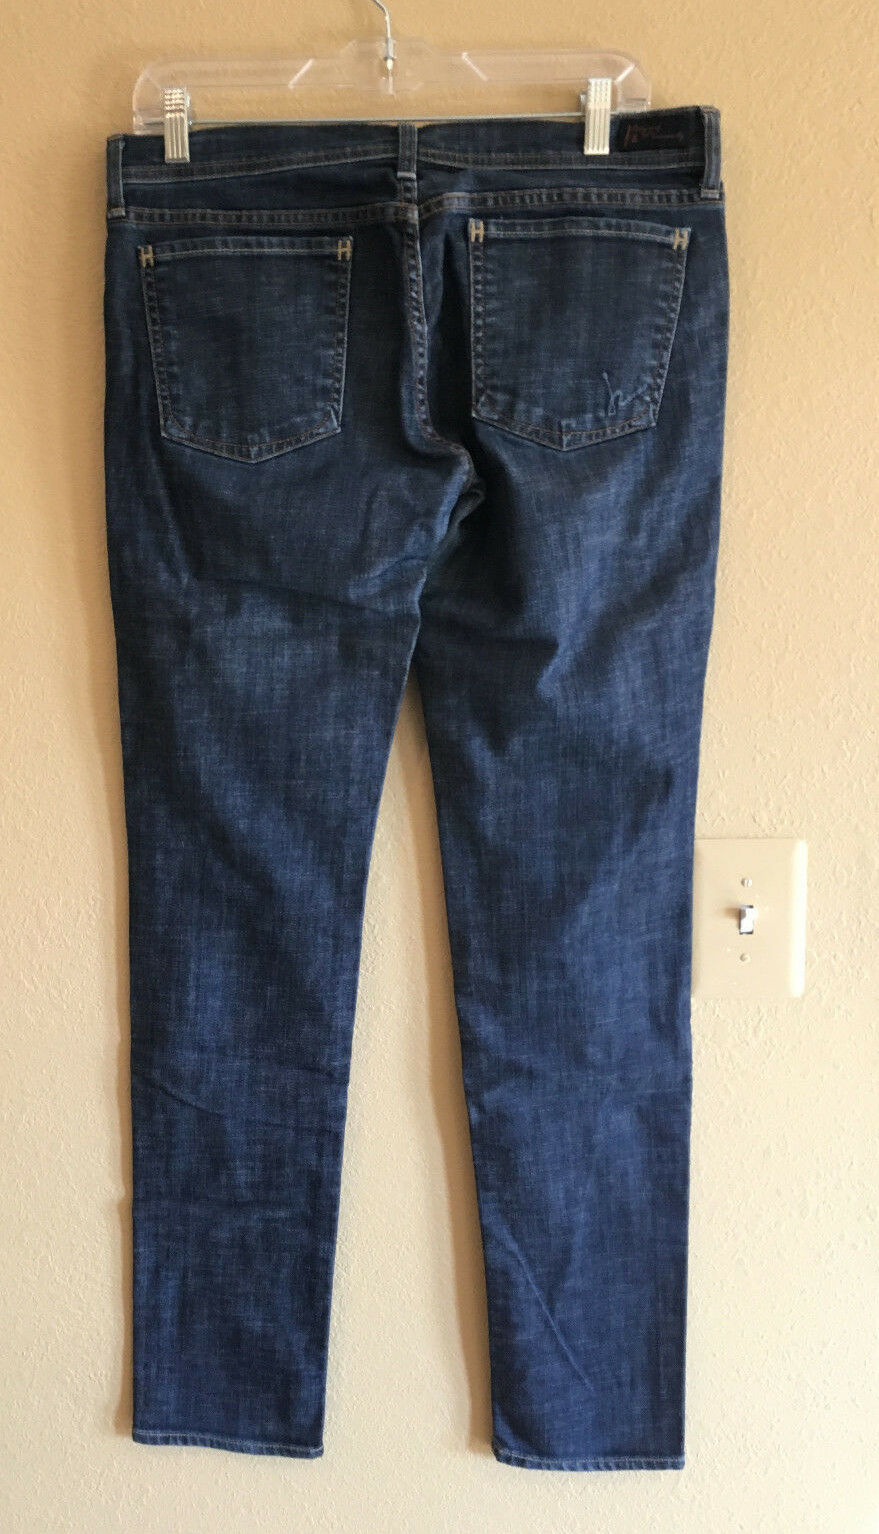 New CITIZENS OF HUMANITY 31 Skinny Jeans Stretch Dark bluee Wash Denim USA Avedon